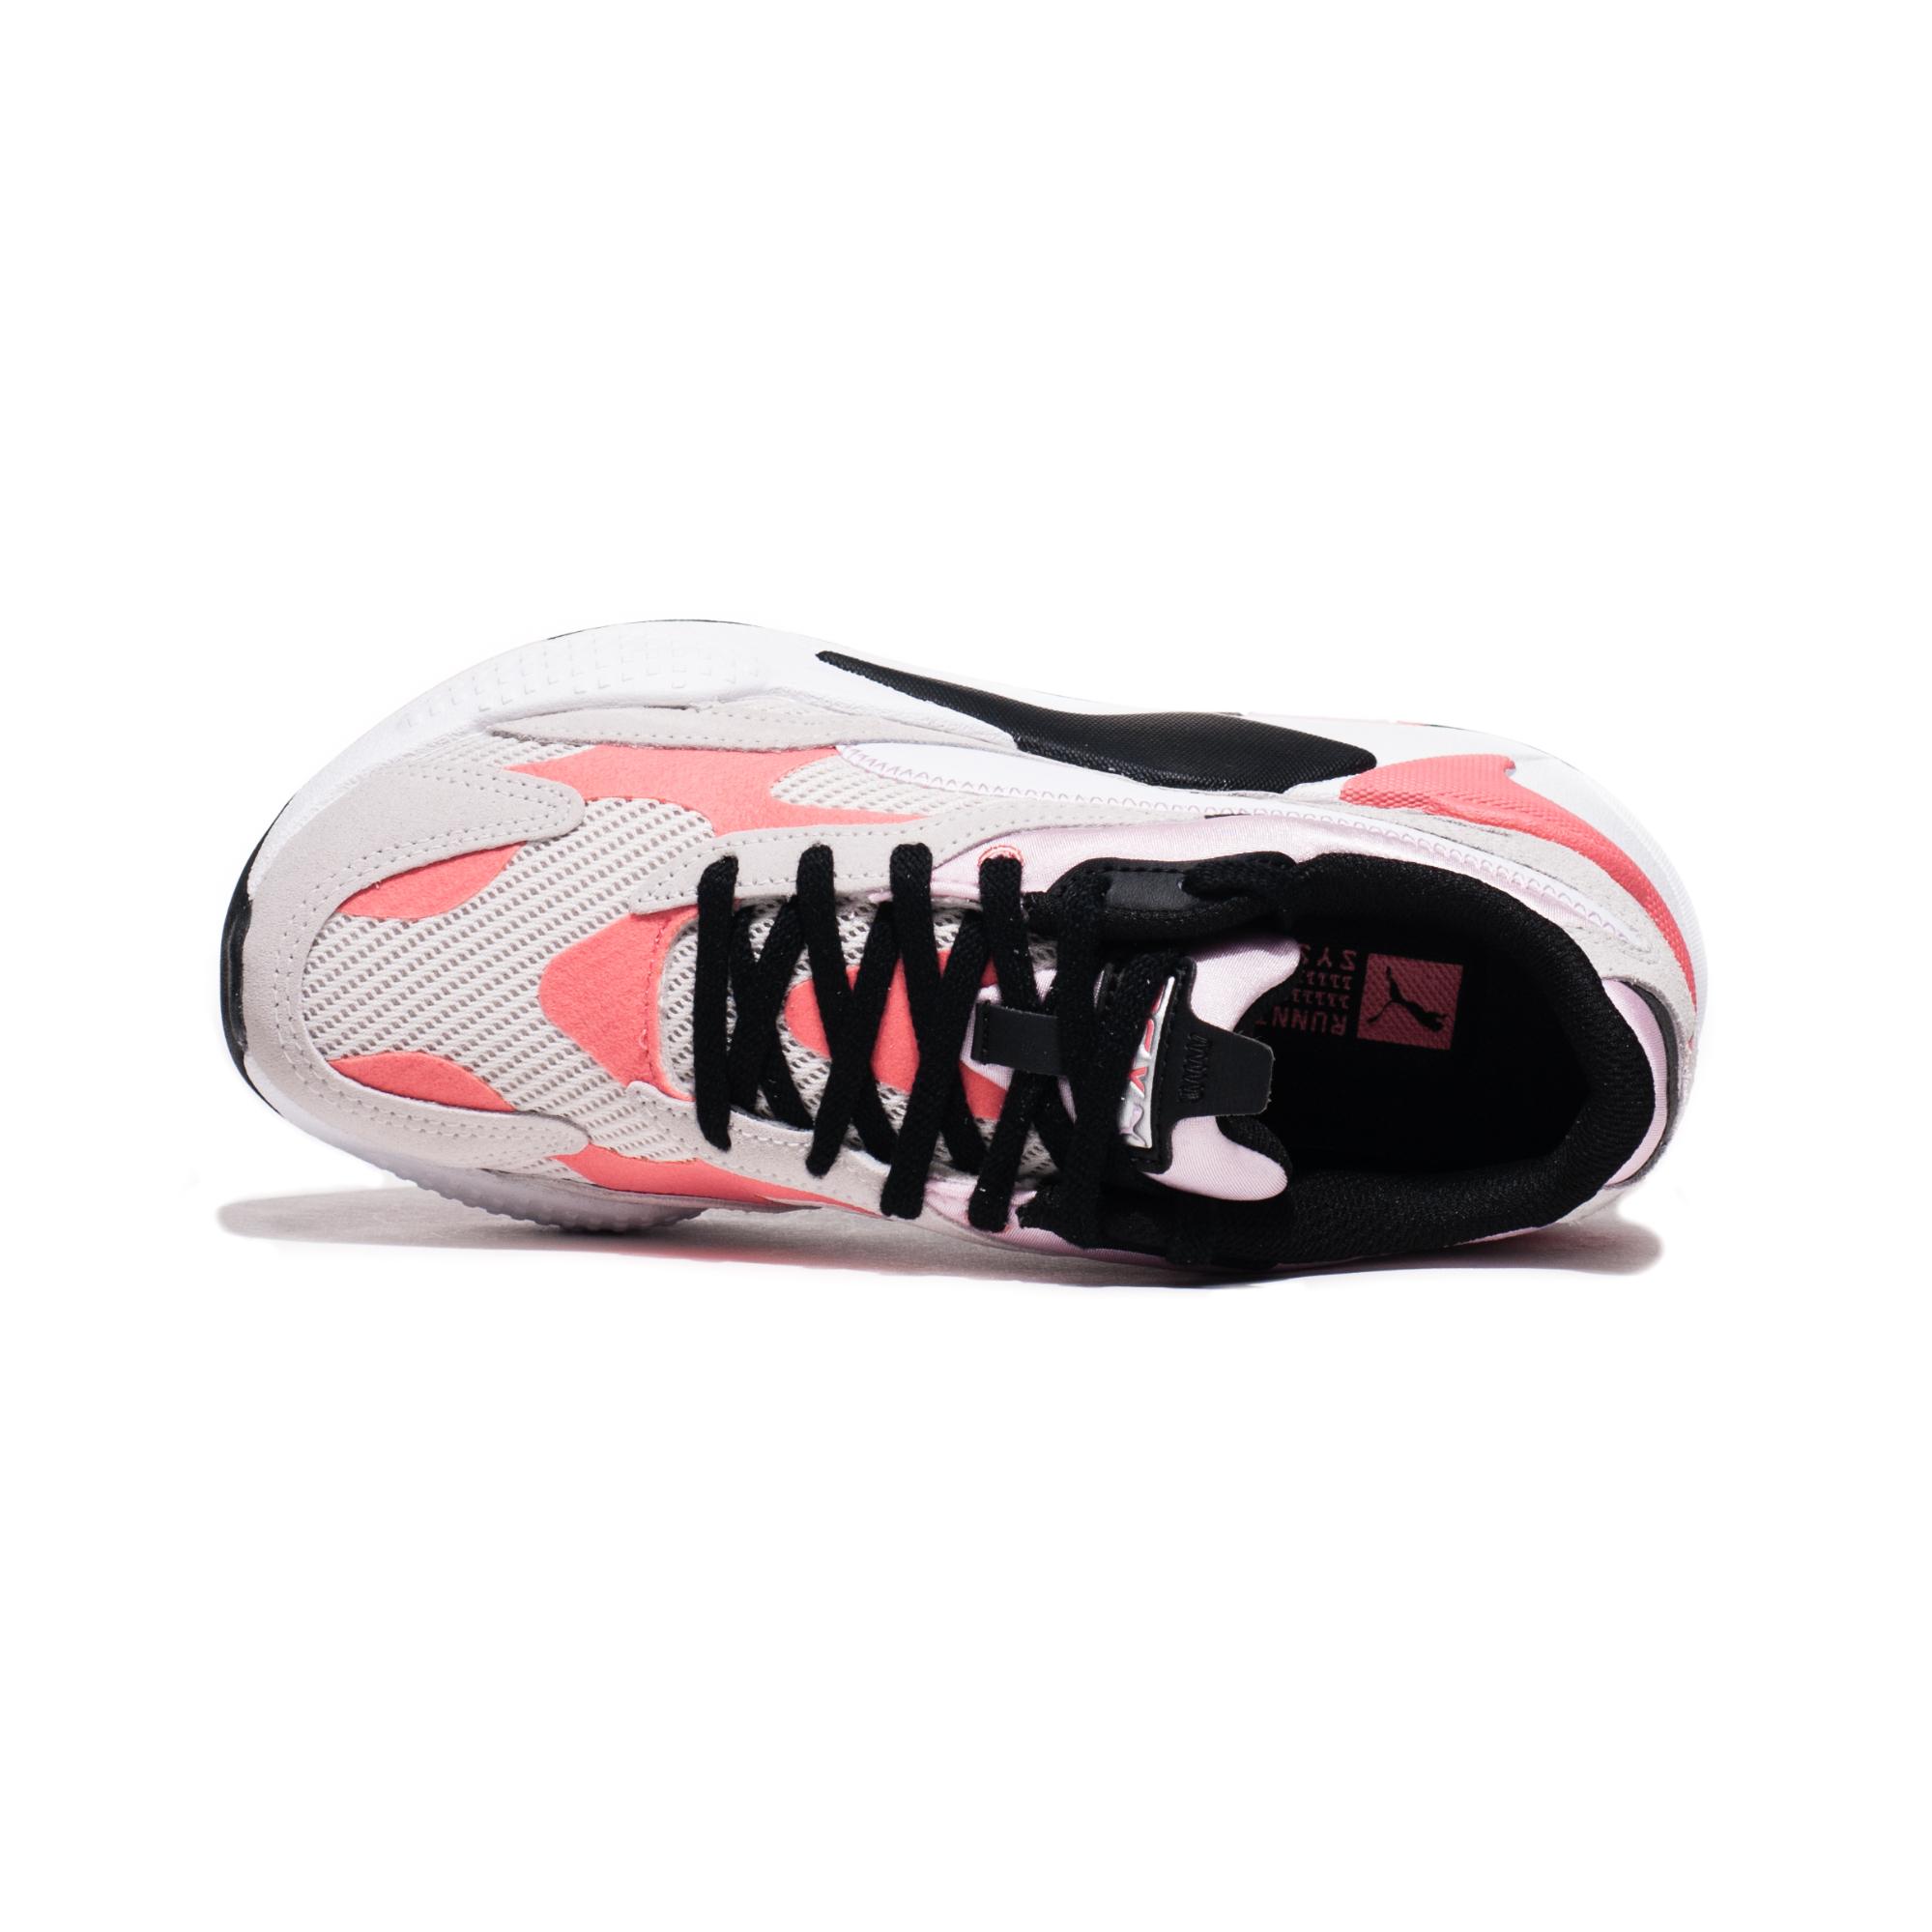 Унісекс кросівки Puma RS-X³ TWILL AIR